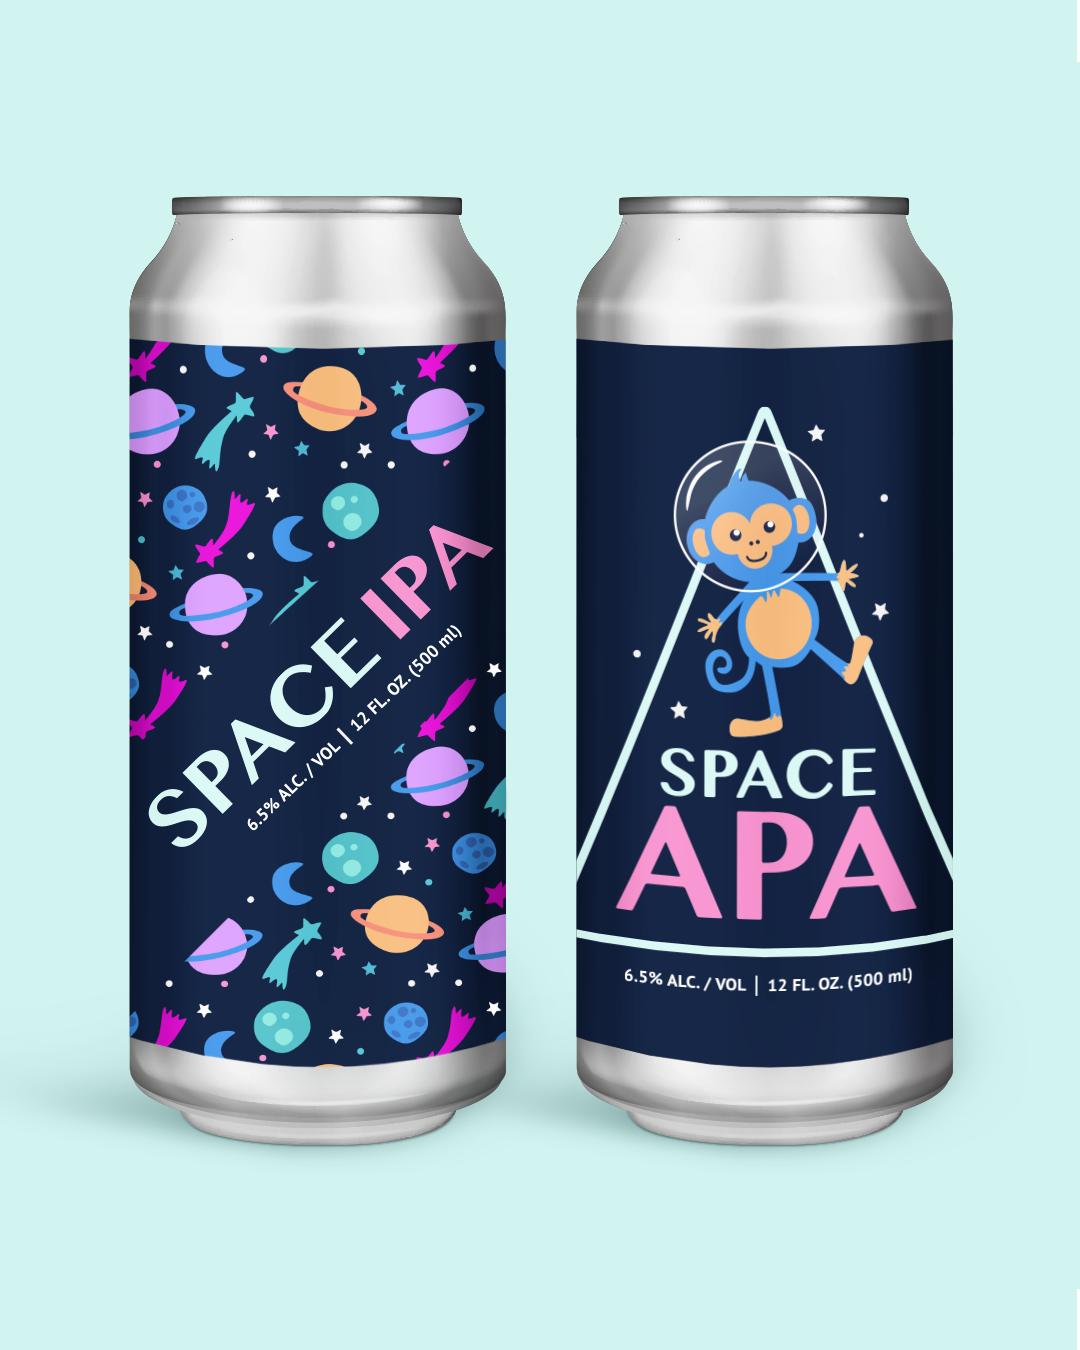 Space_APA_4.5